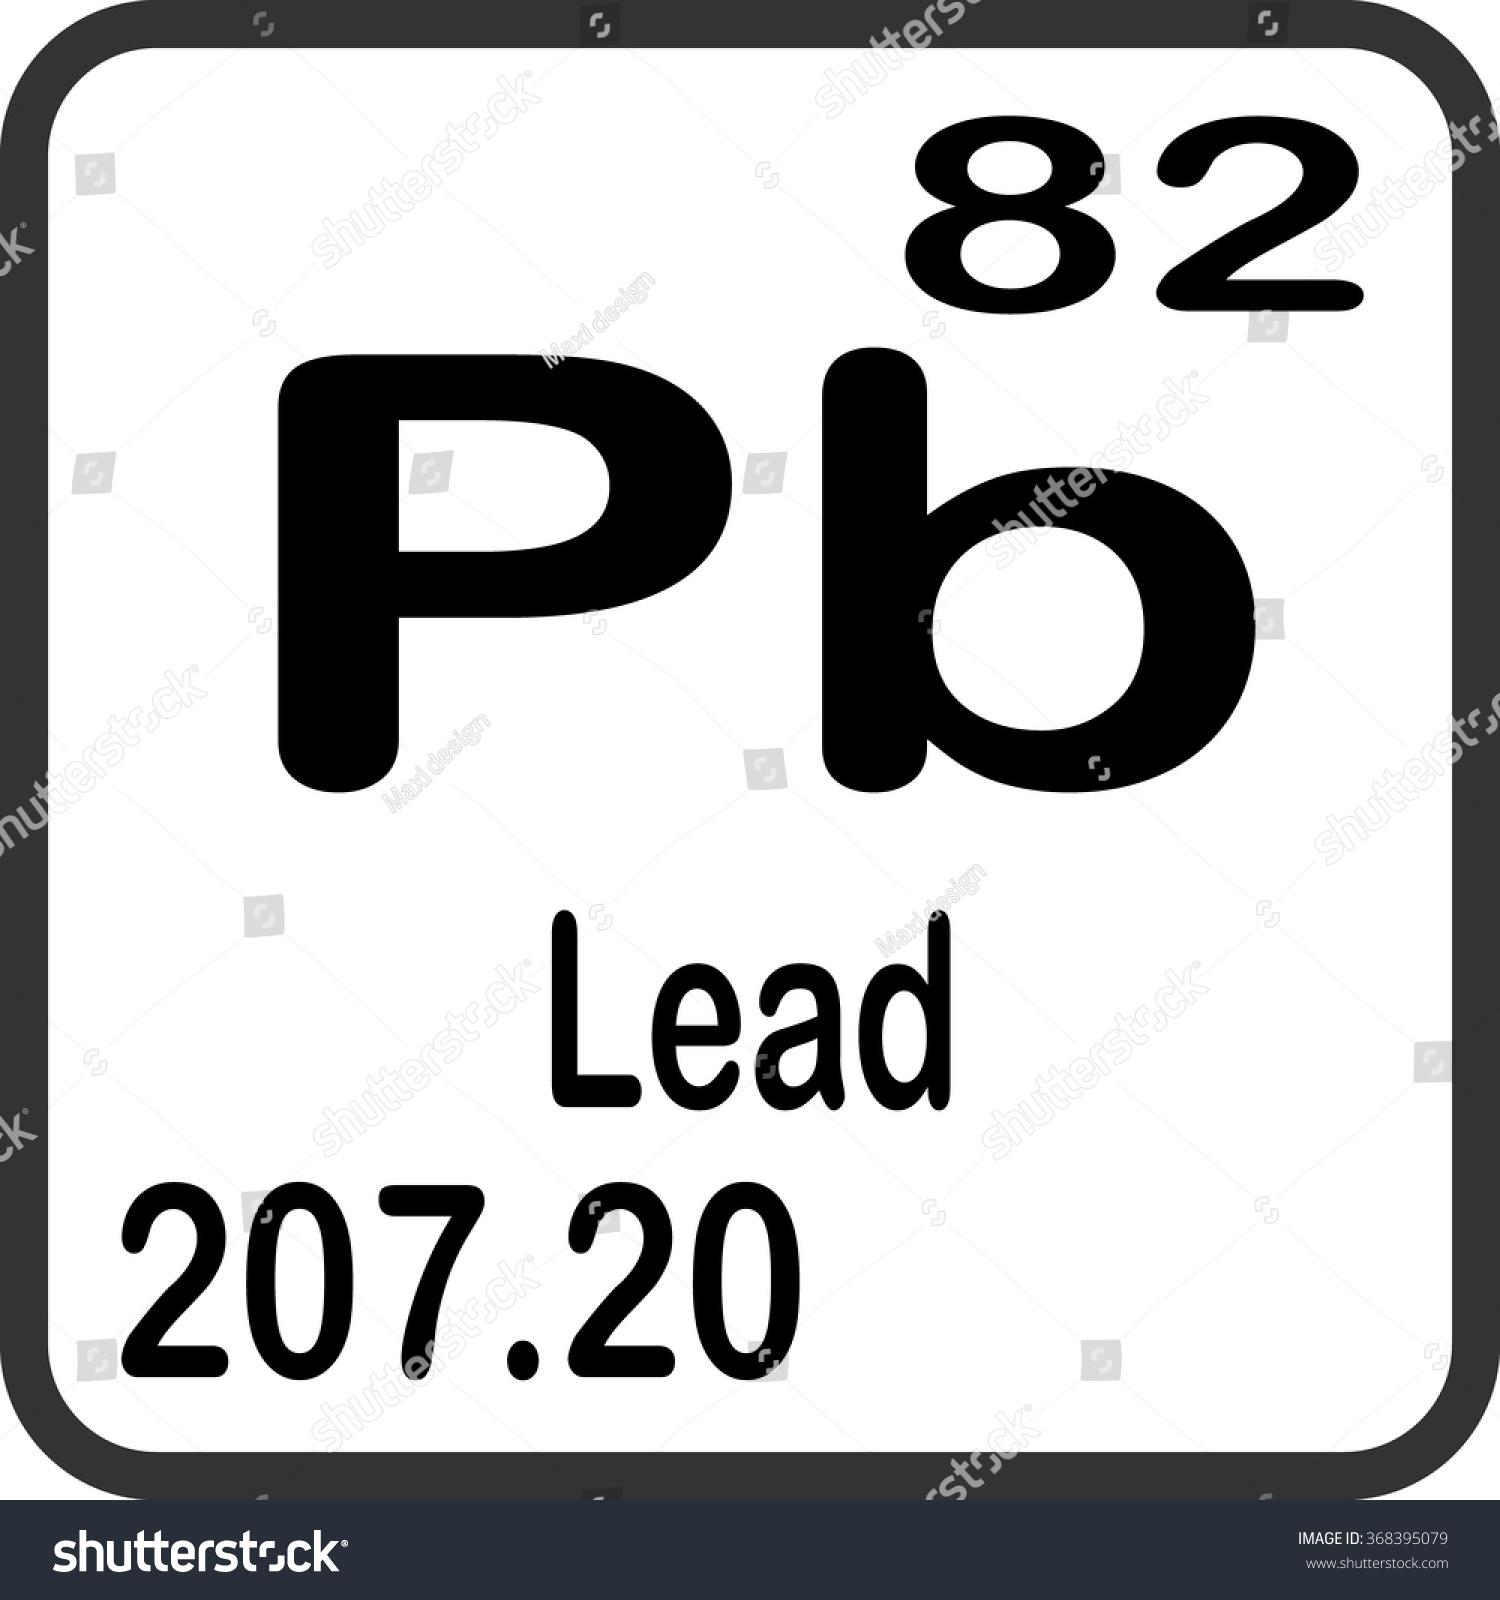 Images Of Lead Element Symbol Spacehero